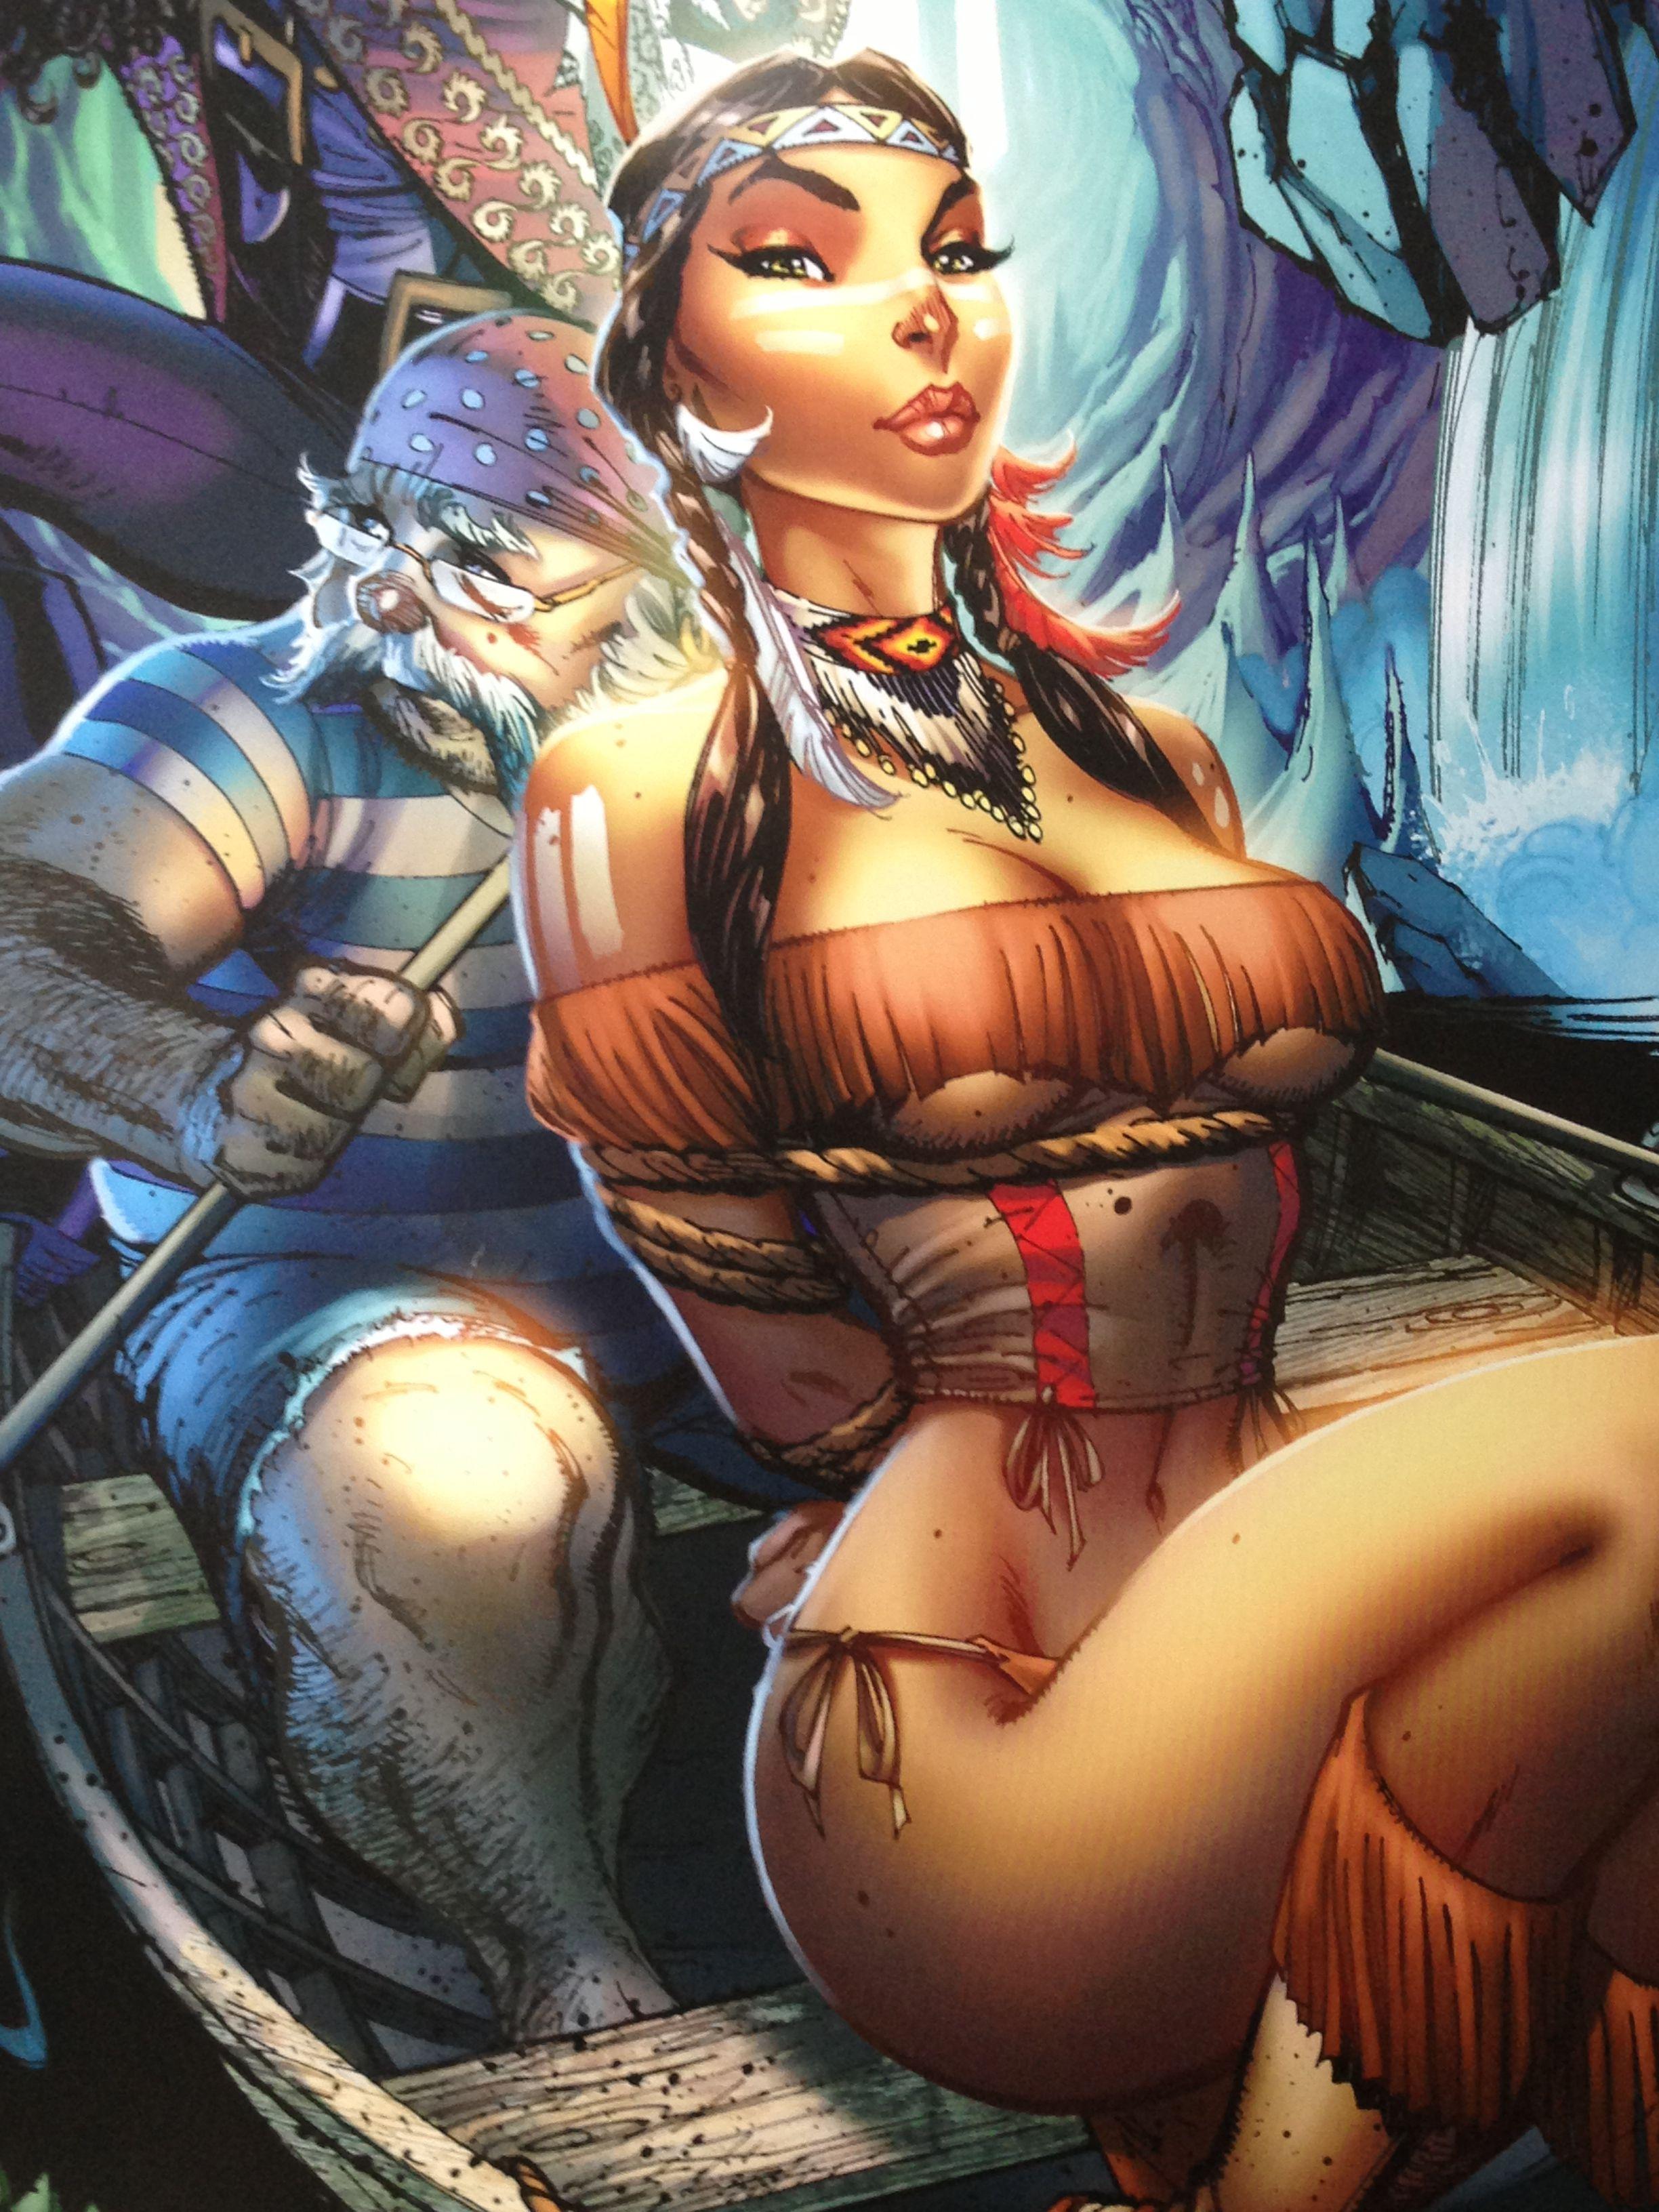 Big boobs american nude